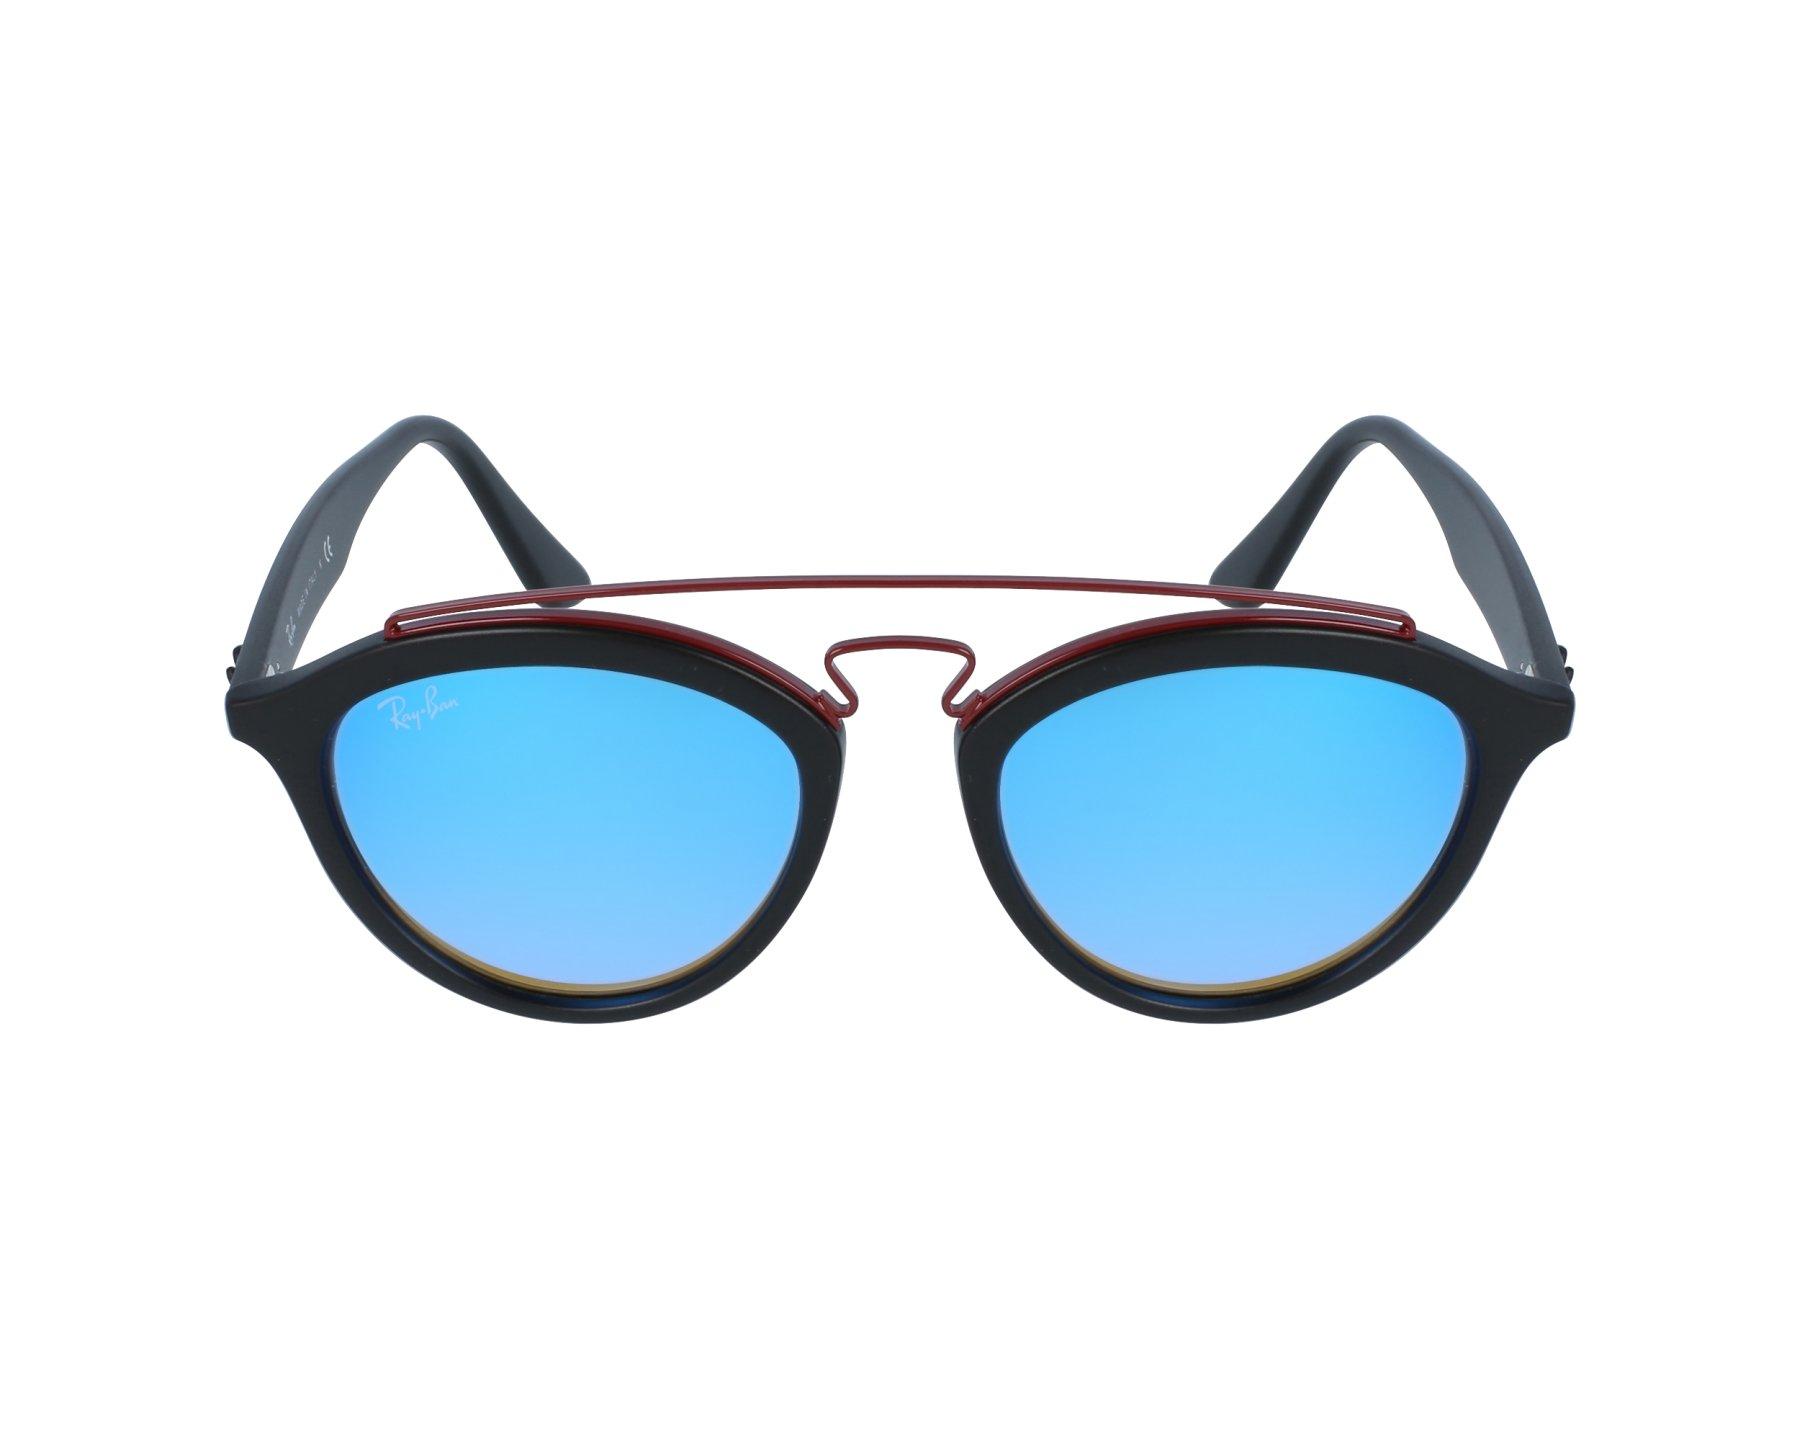 ba8cd04de9 Sunglasses Ray-Ban RB-4257 6252 B7 50-19 Black Bordeaux profile